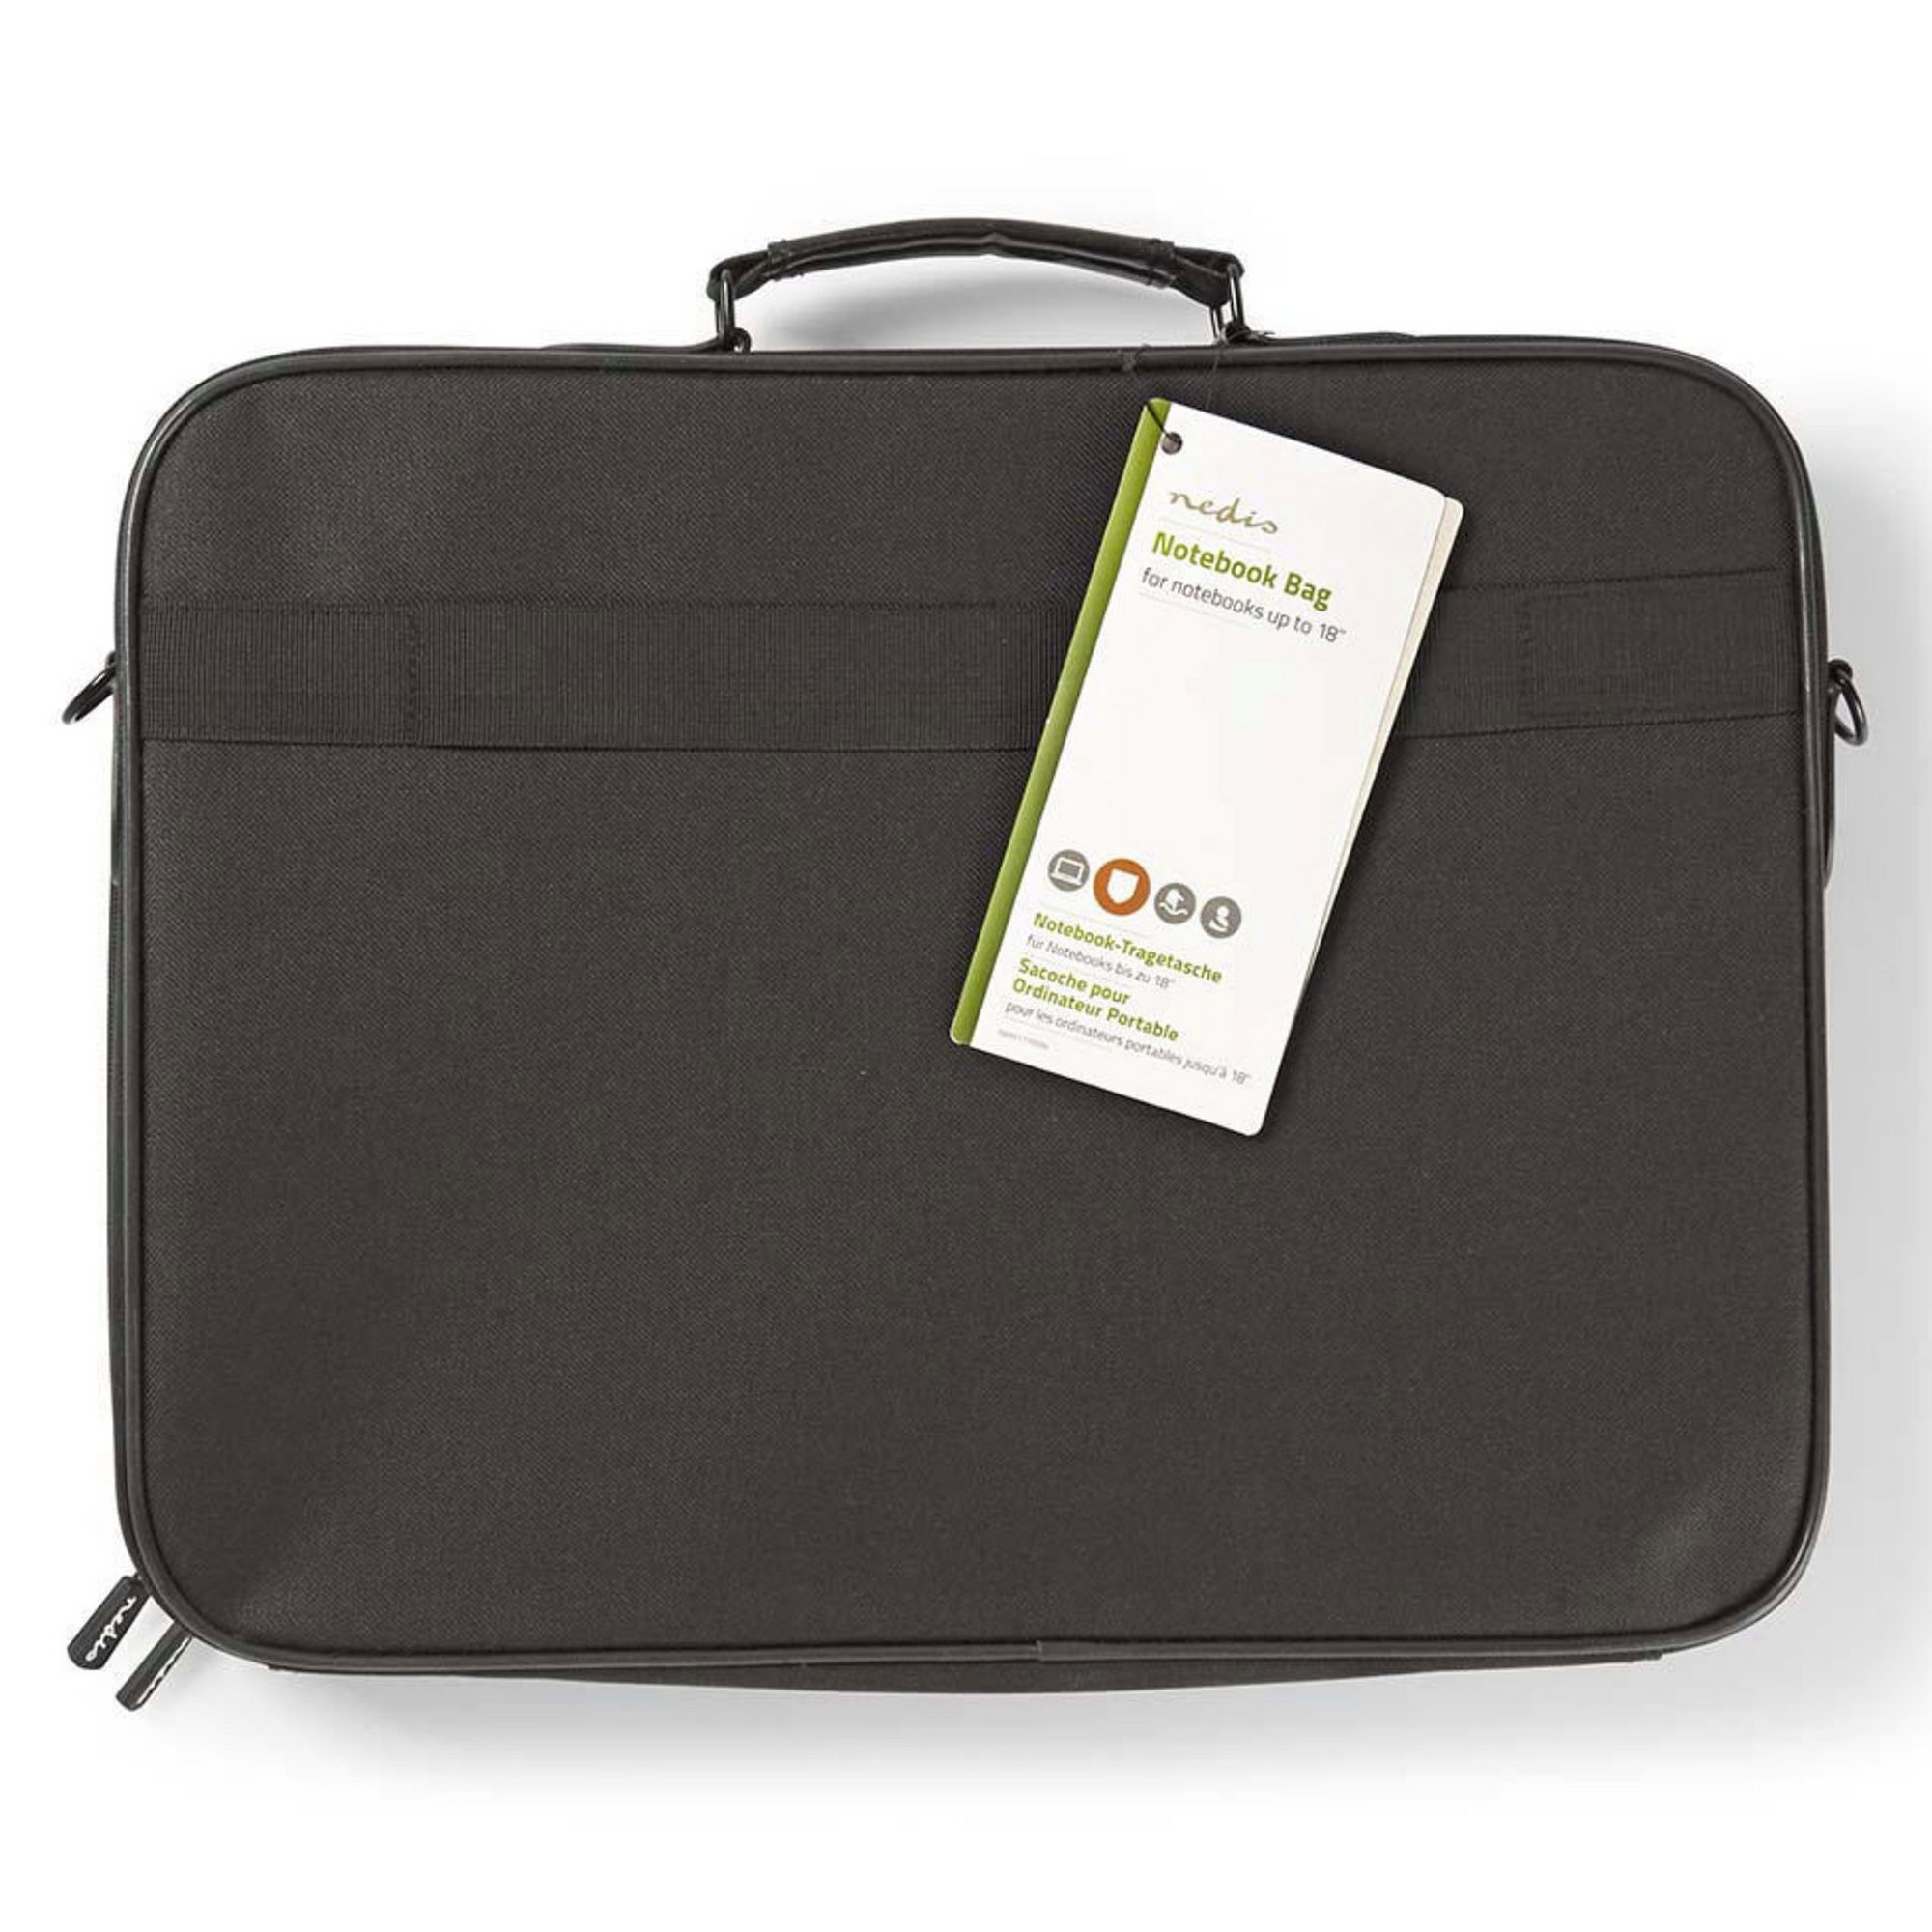 Image of Nedis Large Notebook Laptop Bag